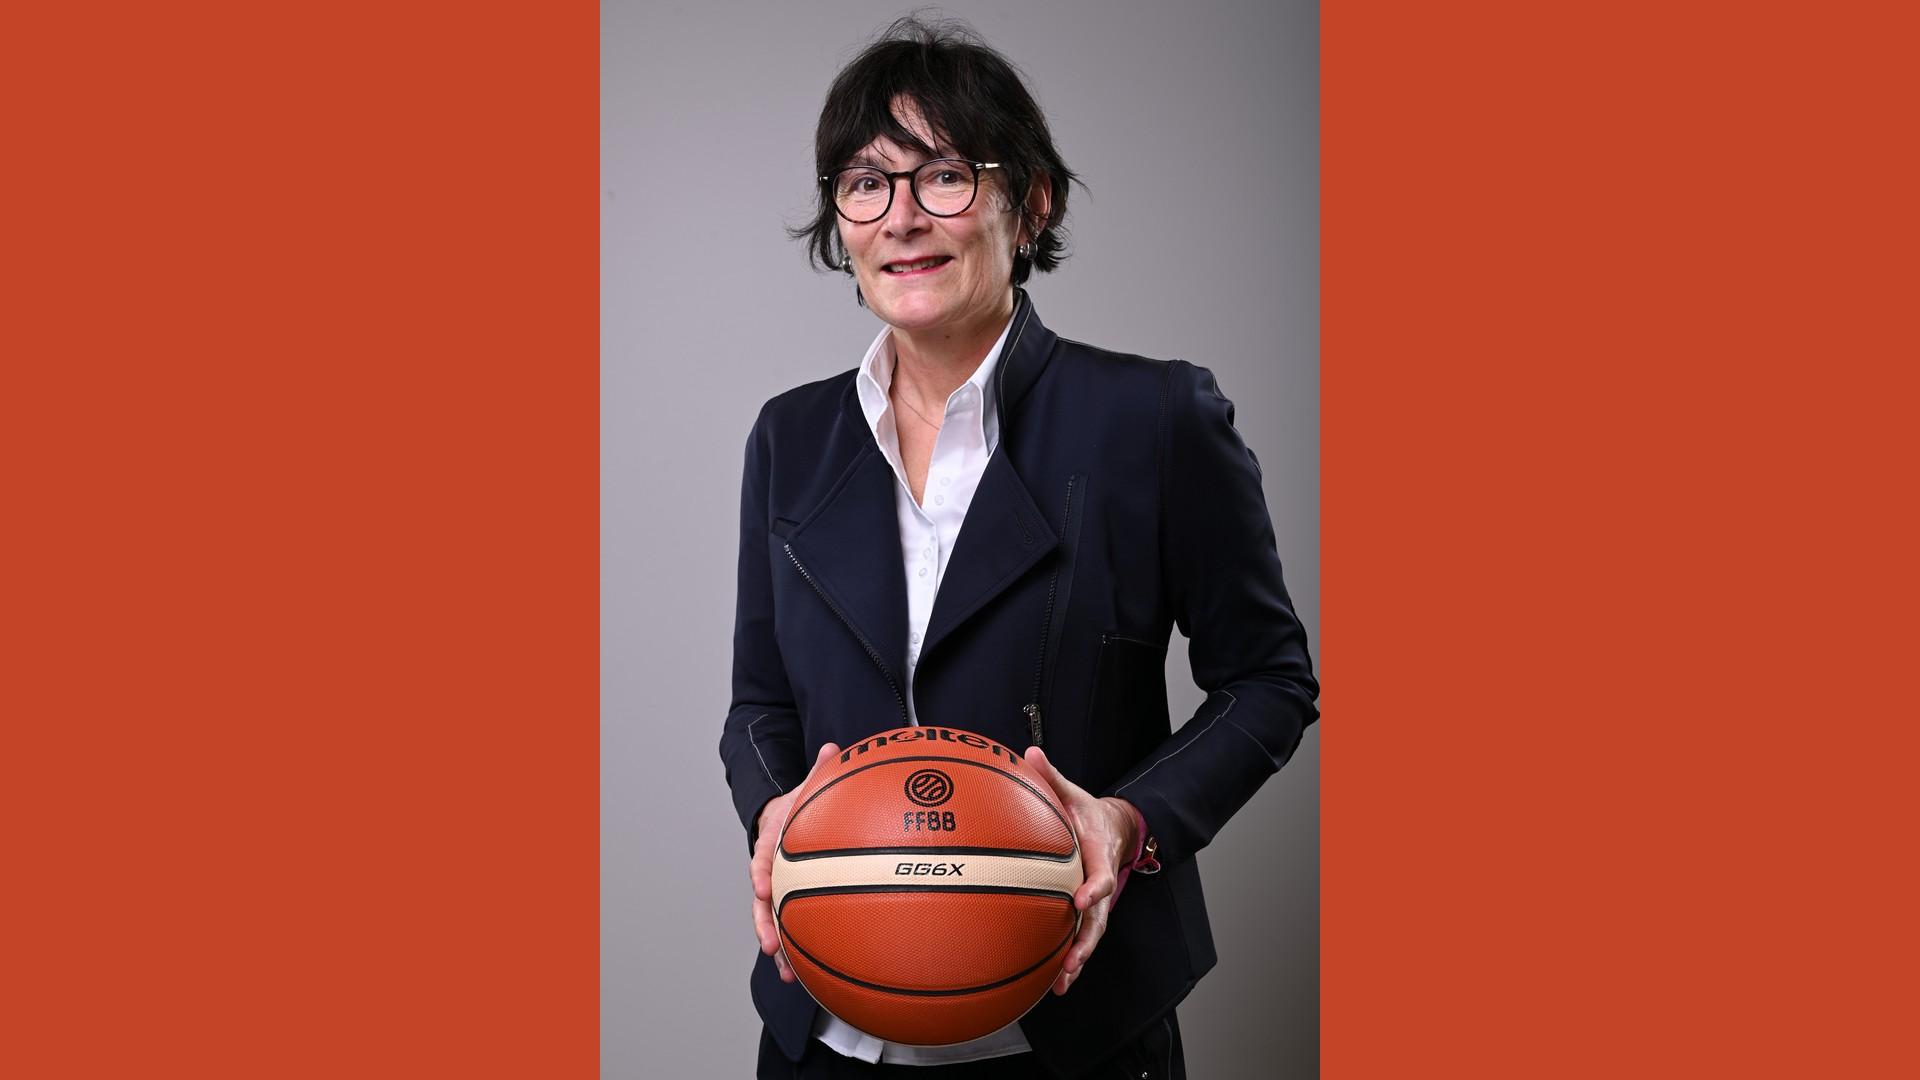 Force Carole (1) Basket-ball